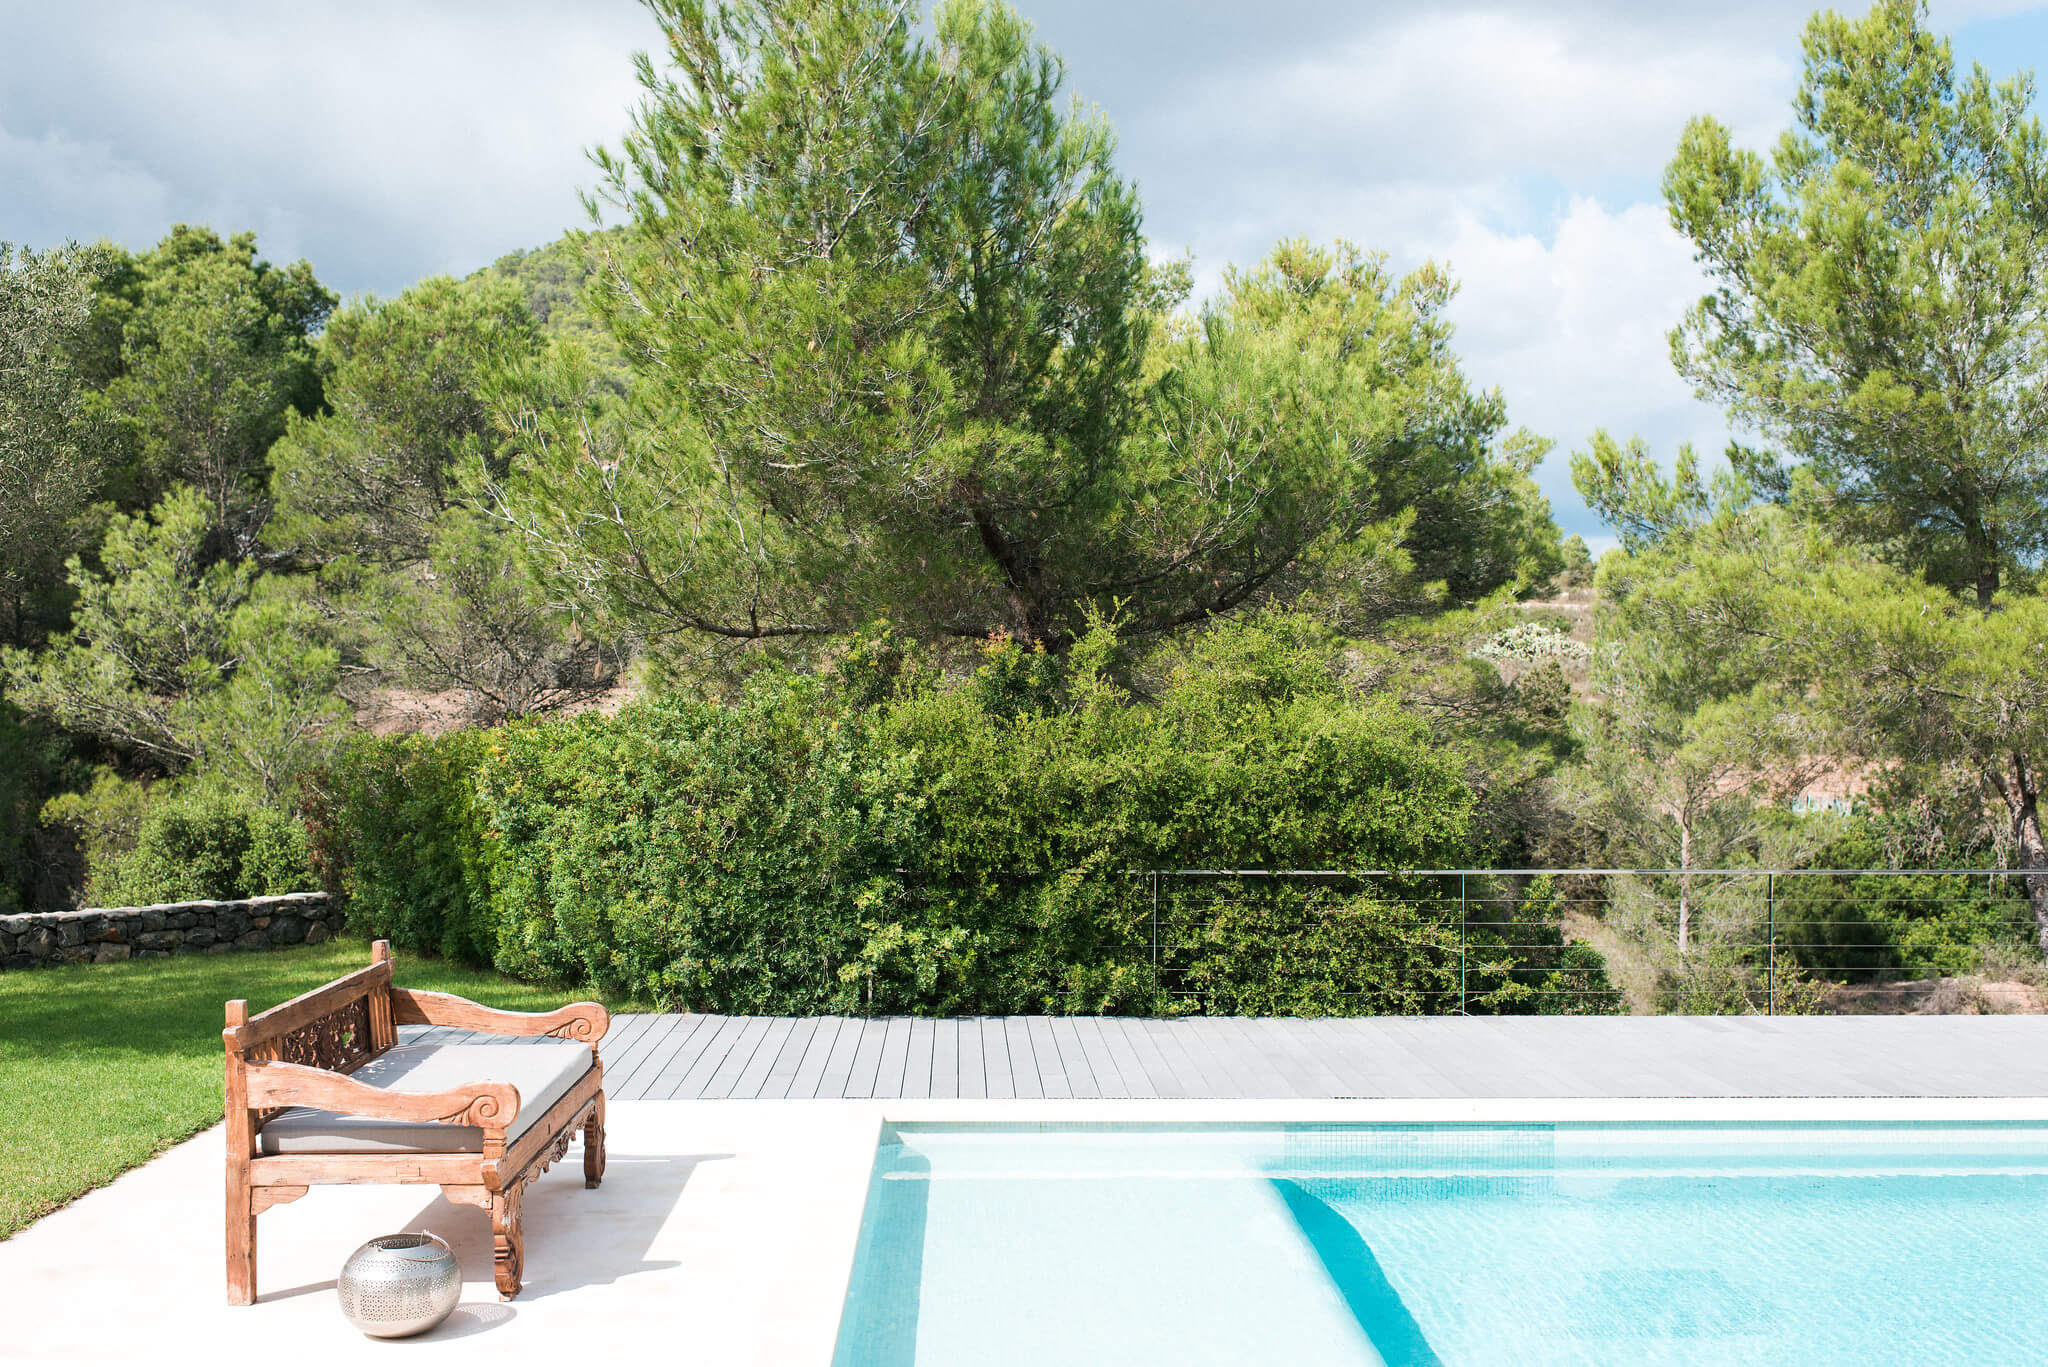 https://www.white-ibiza.com/wp-content/uploads/2020/05/white-ibiza-villas-casa-estrella-exterior-pool-chair.jpg